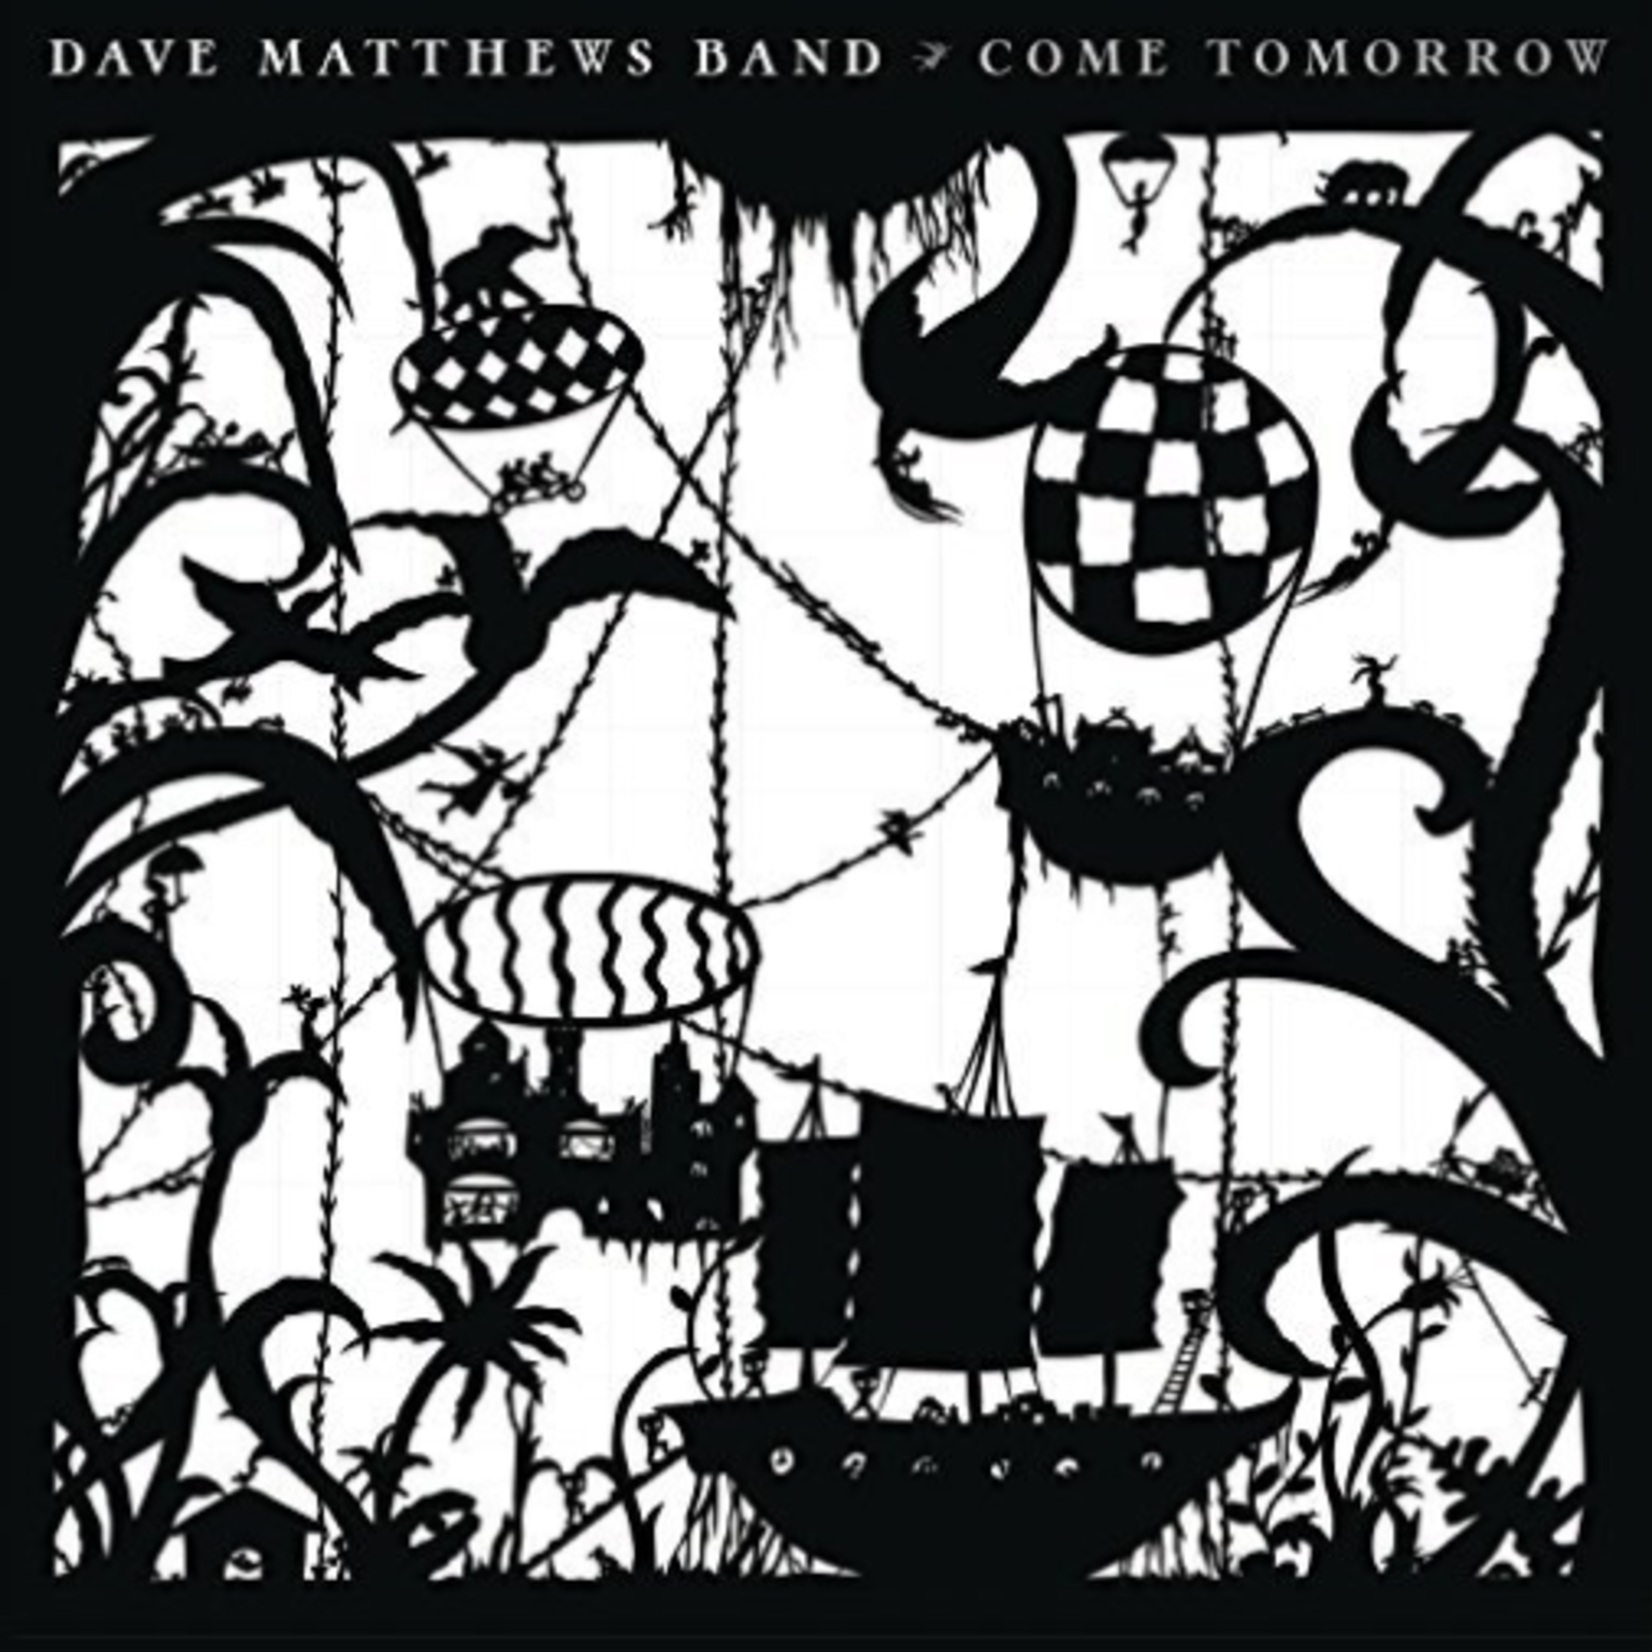 DAVE MATTHEWS BAND COME TOMORROW